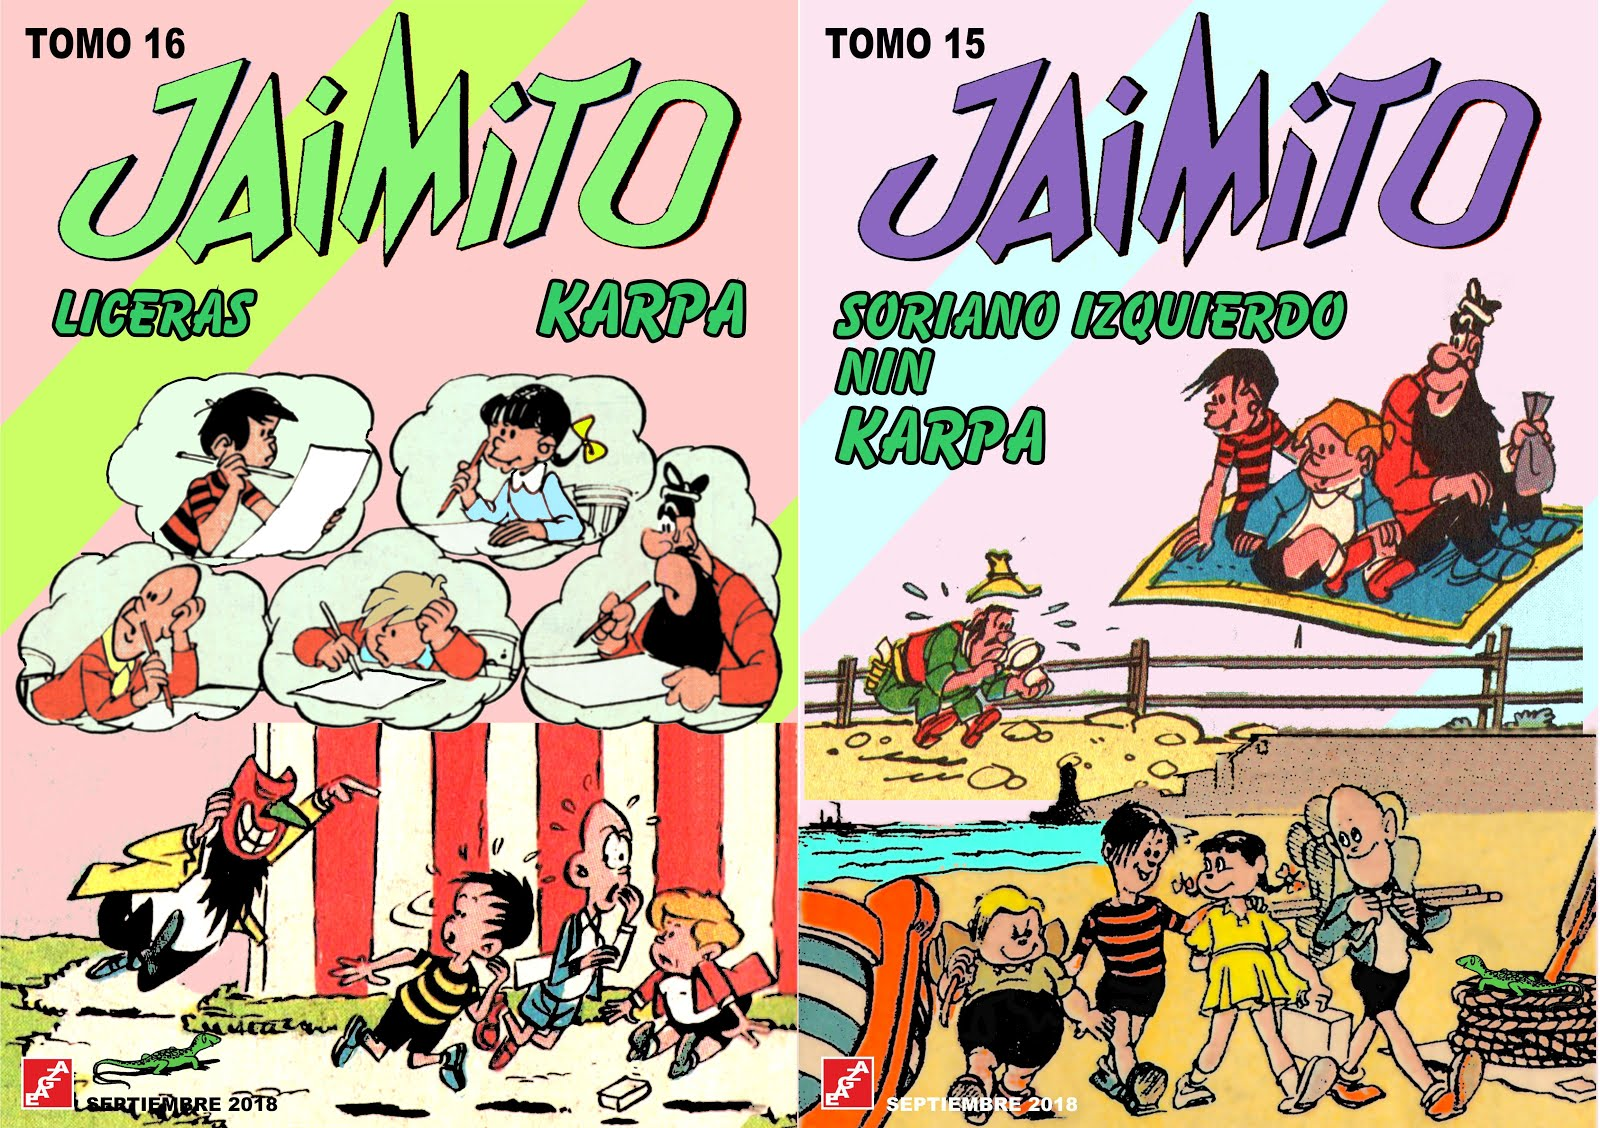 Jaimito - 16 Tomos - Karpa - EAGZA (Aventuras de Jaimito)